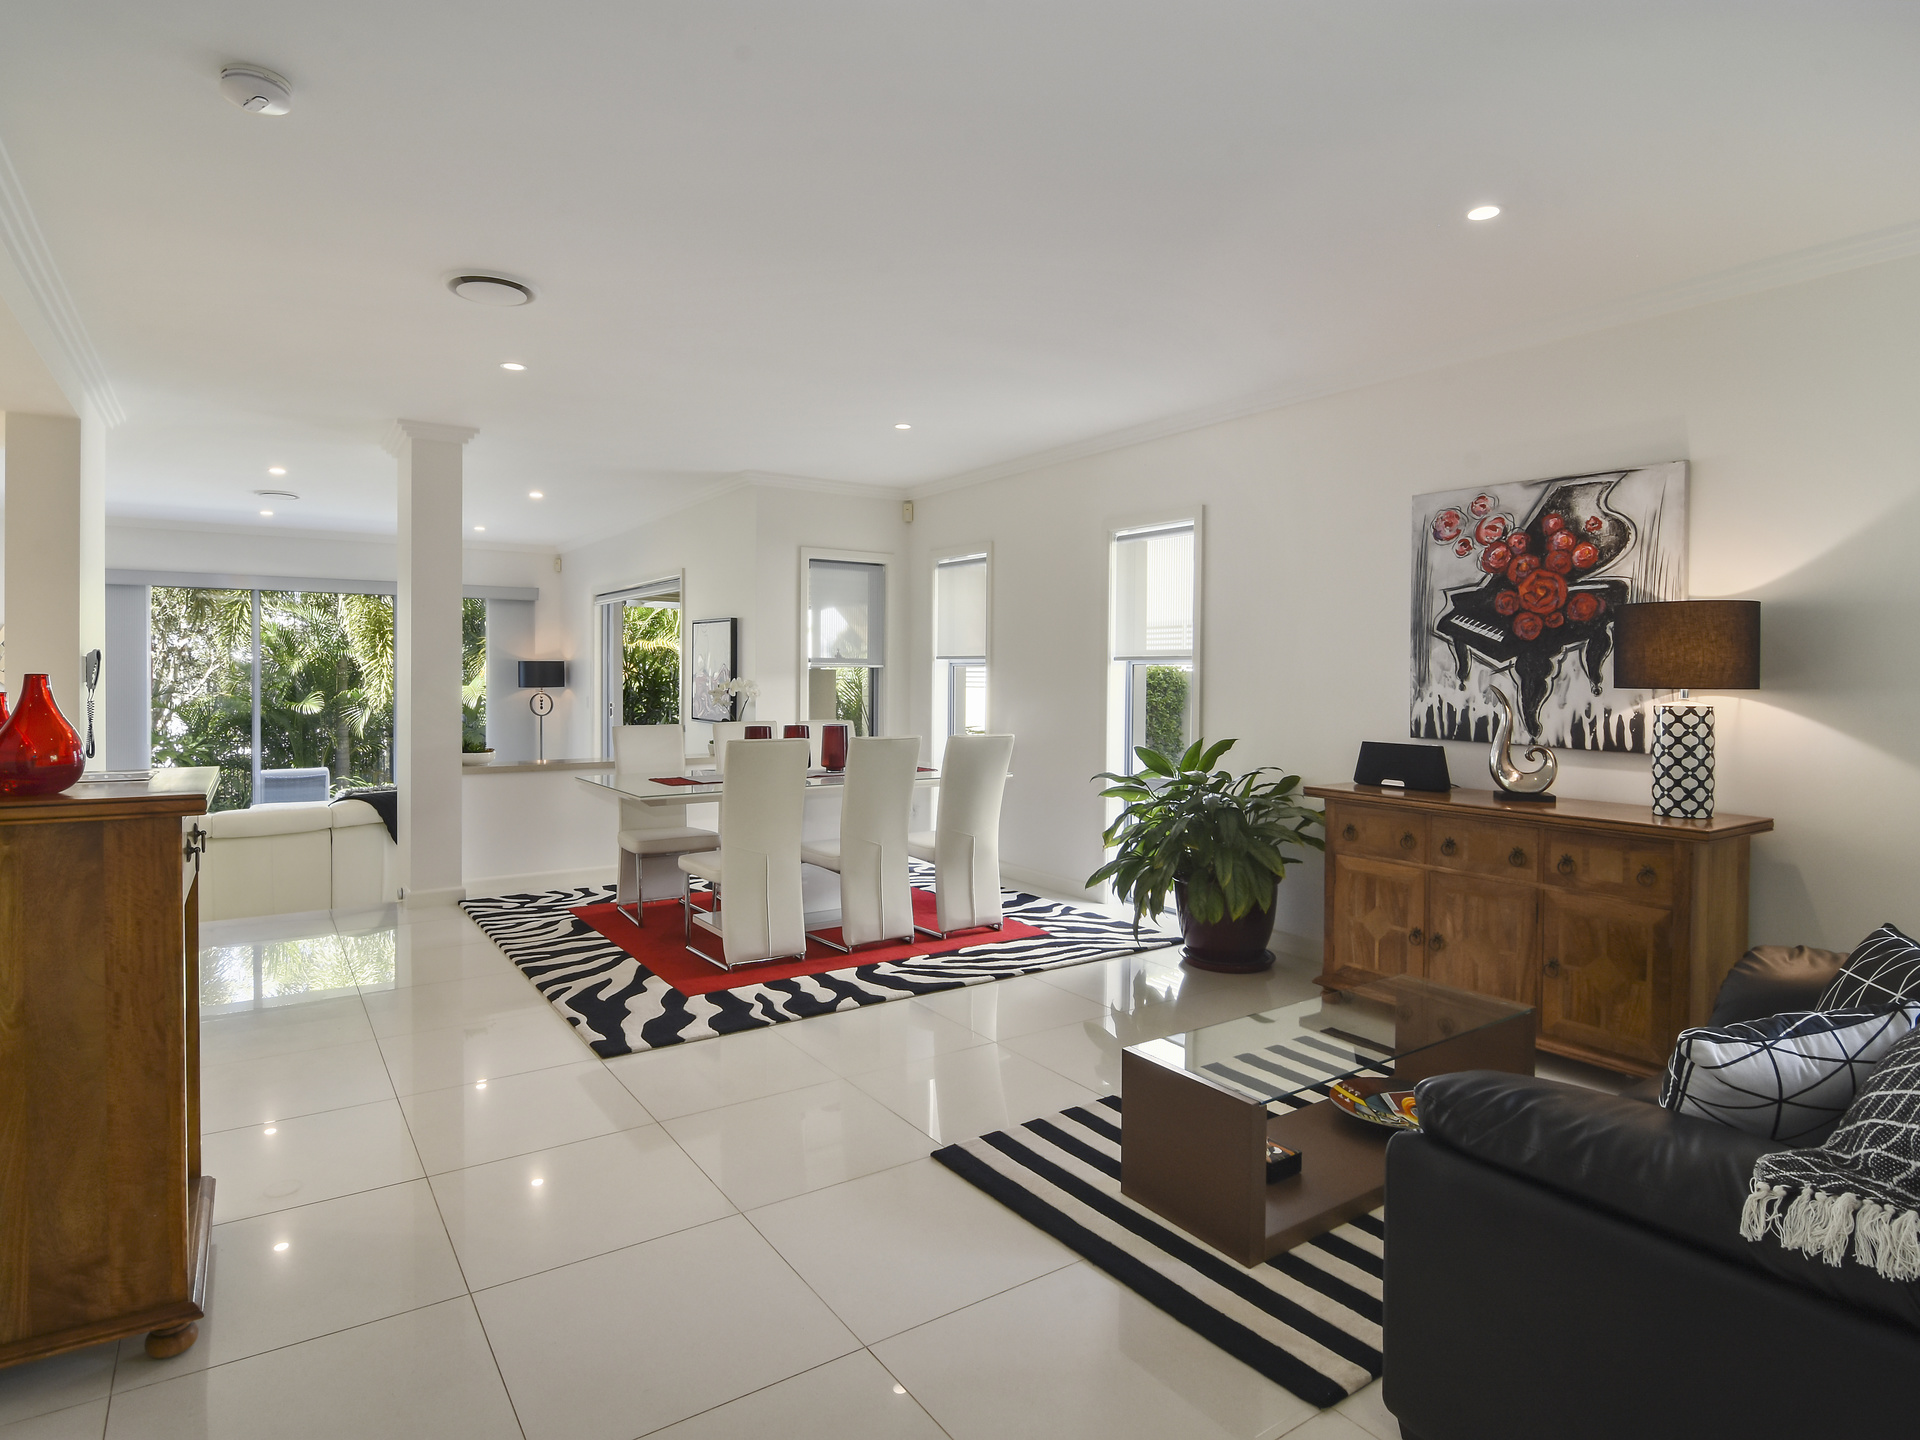 Real Estate   Gold Coast   Chevron Realty   007 Open2view Id561419 6020 Vista Drive Royal Pines